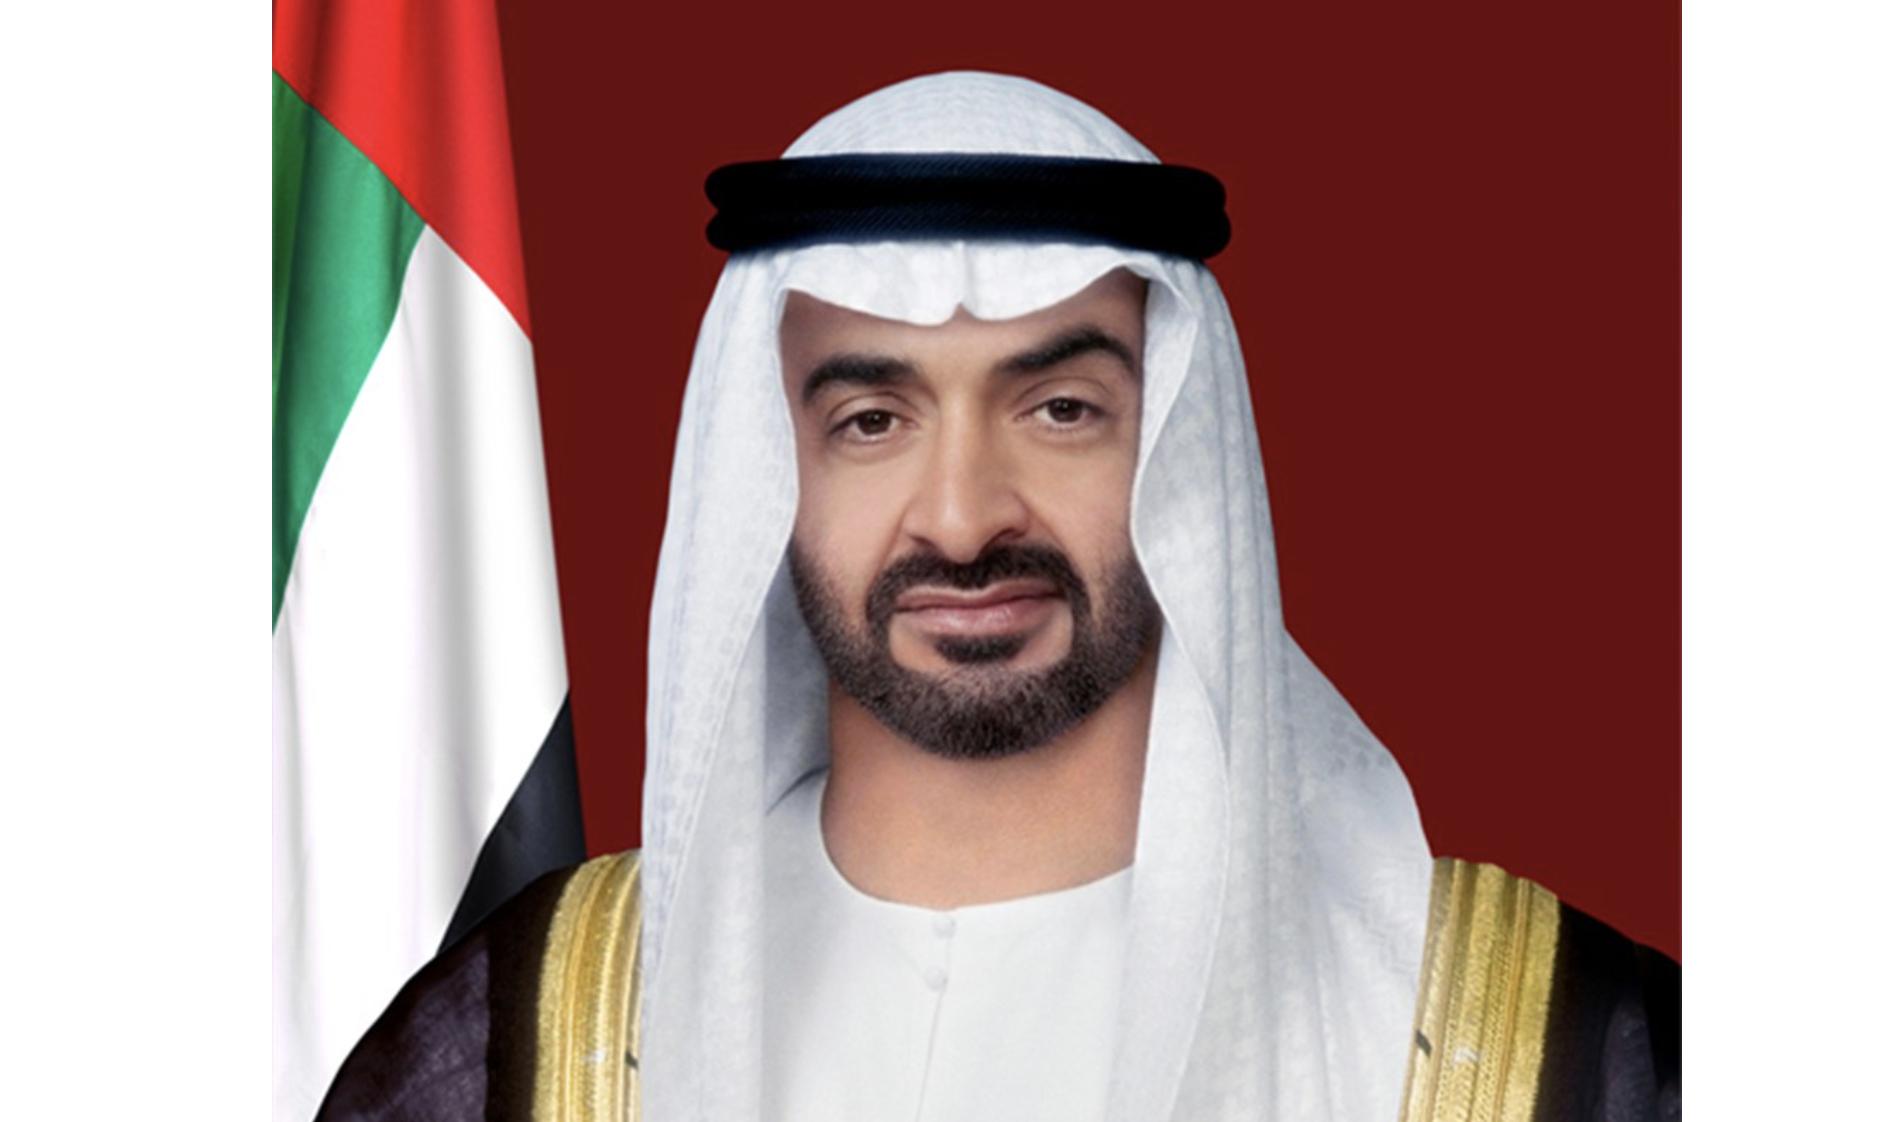 Sheikh Mohamed bin Zayed to visit Austria on Thursday